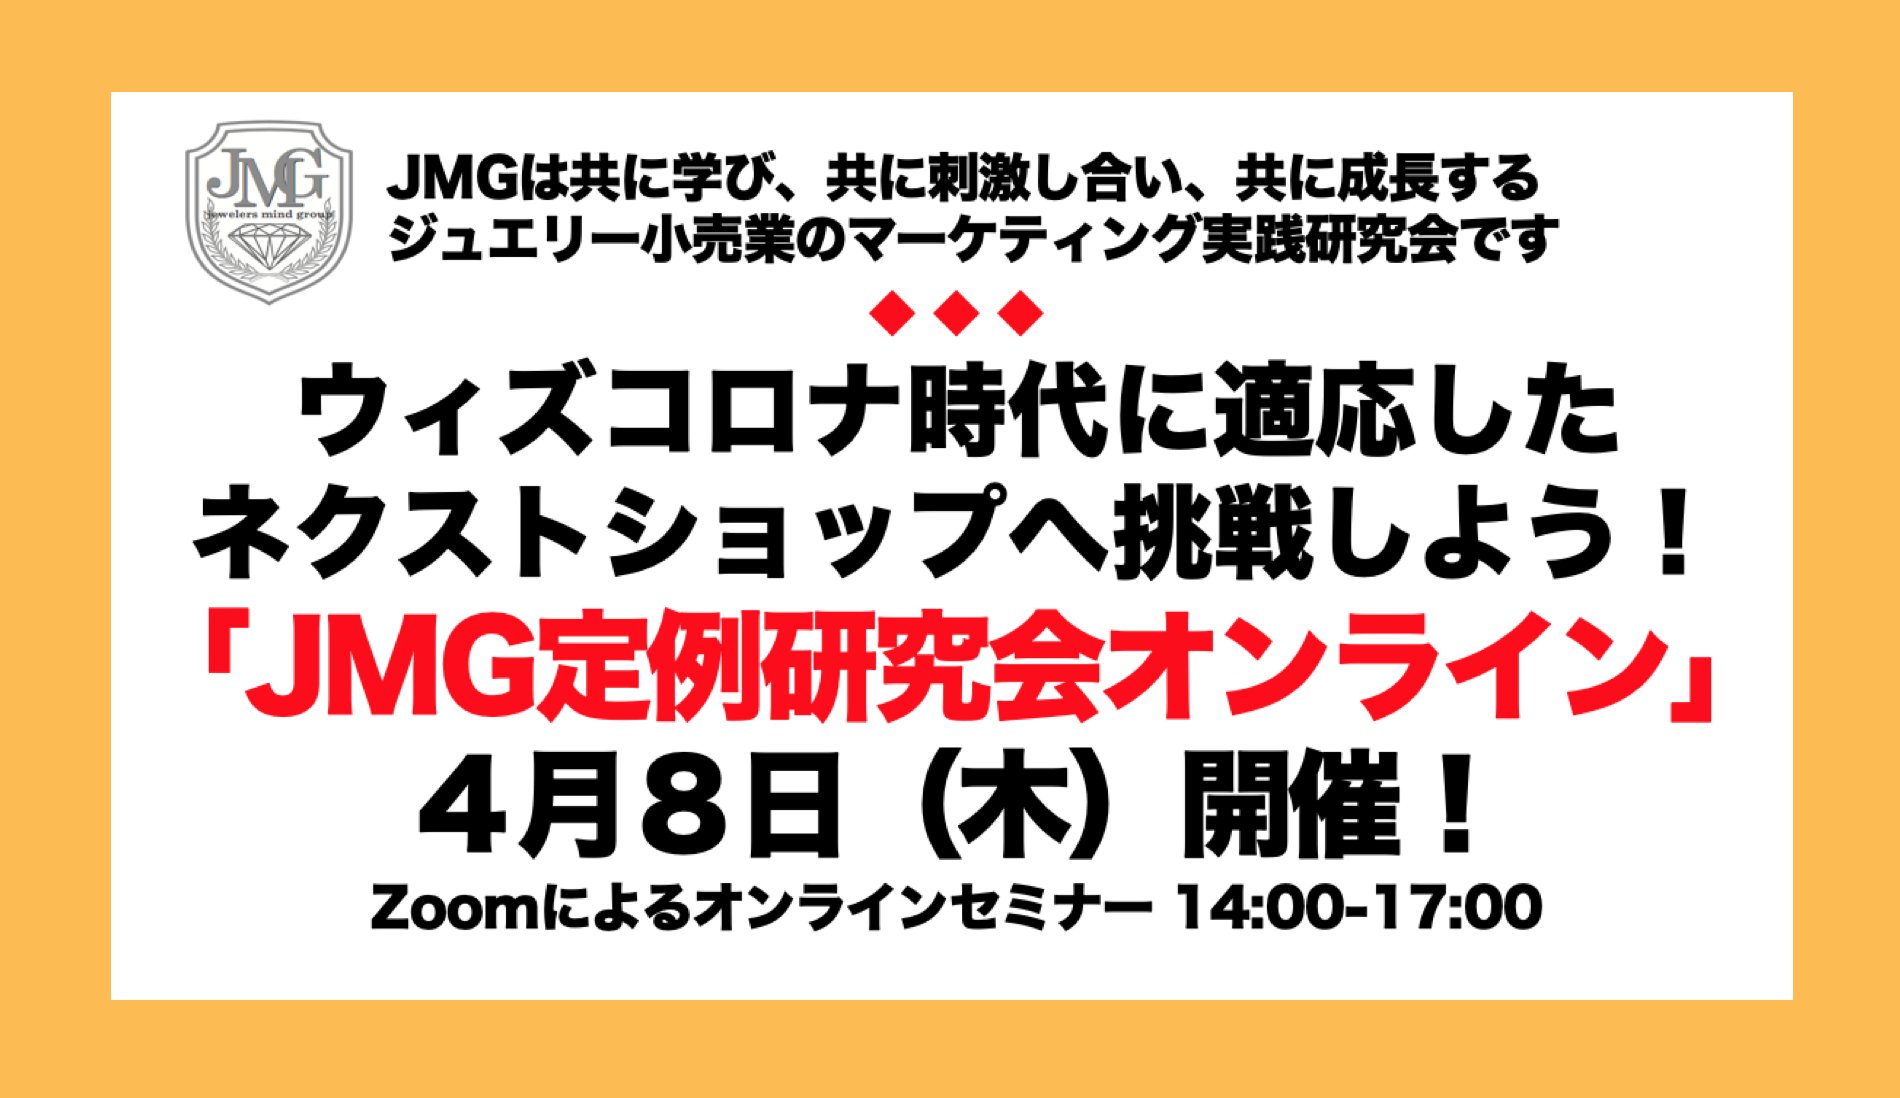 JMG定例会